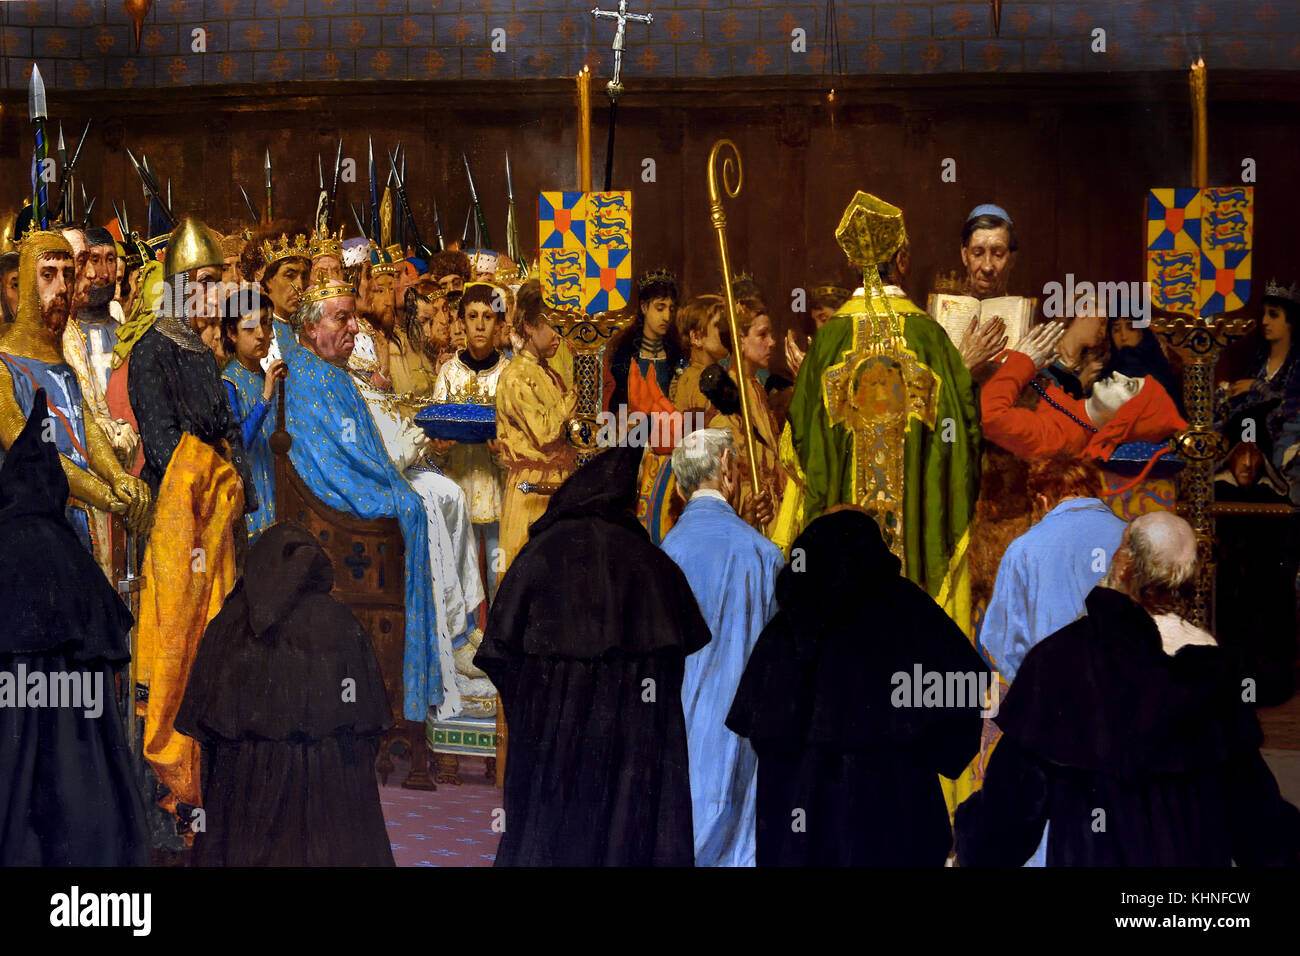 Funeral for Charles Le Bon, held in Bruges in St Christophe church on 22 April 1127 ( detail ) 1876  Jan Van Beers - Stock Image